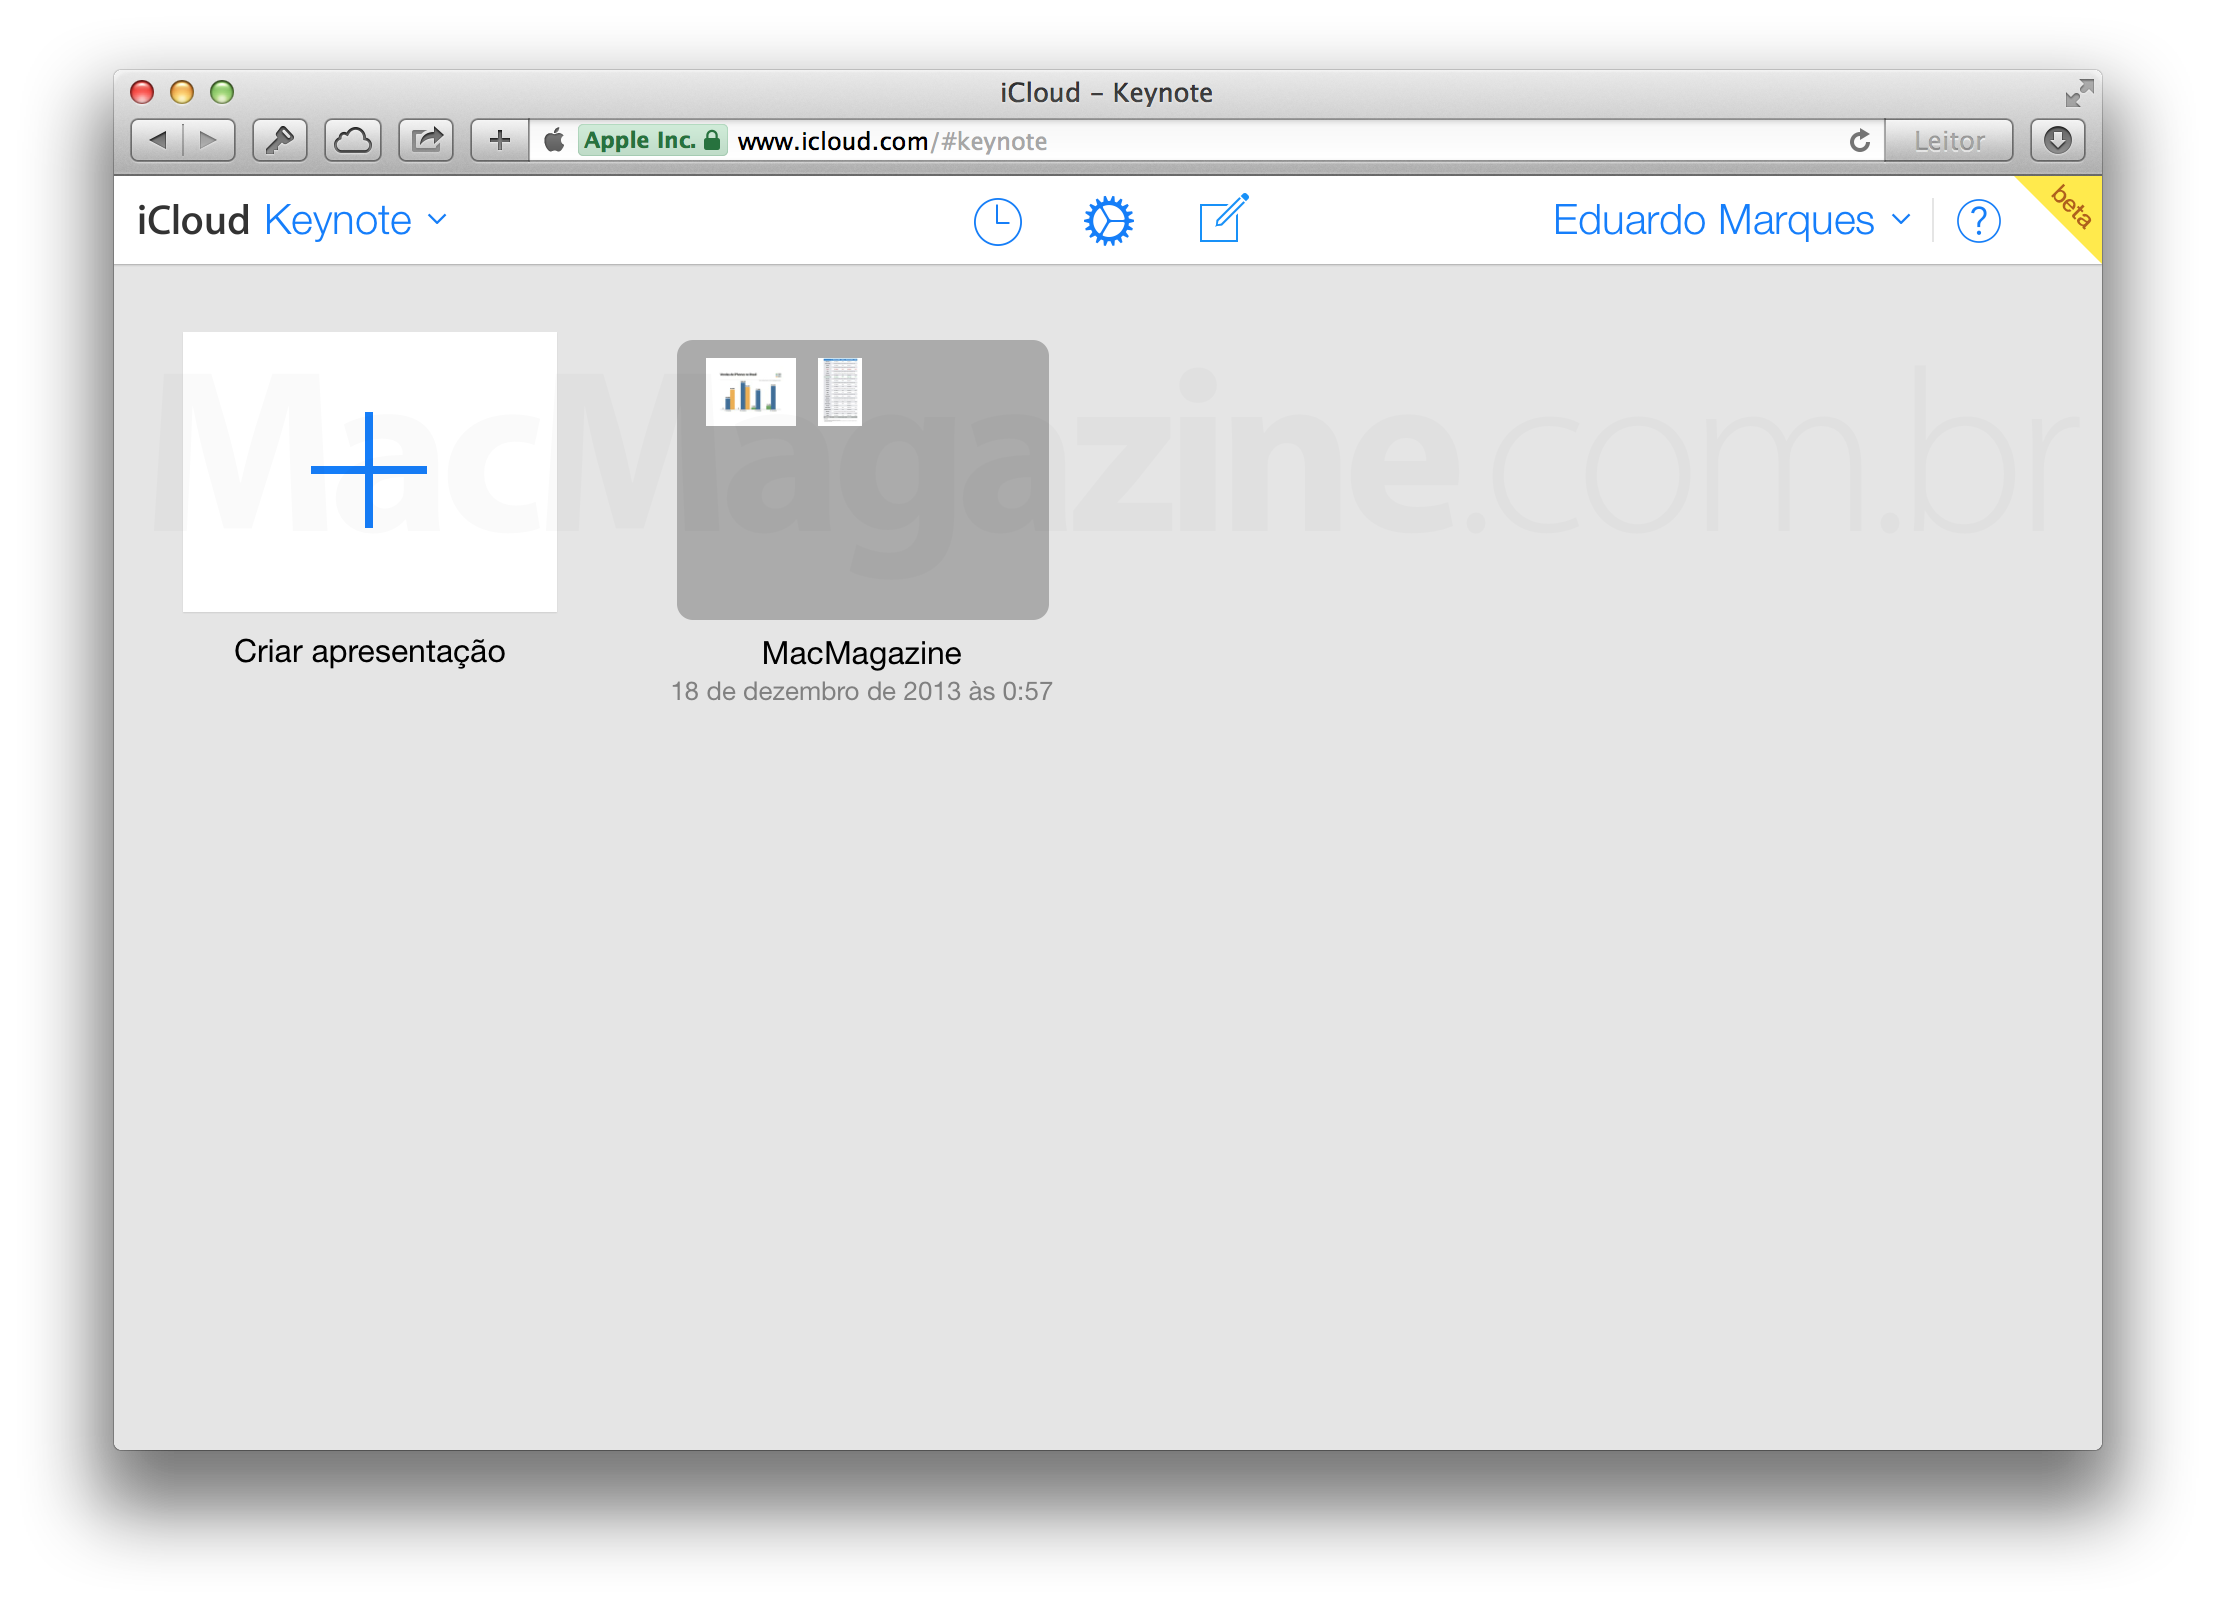 Keynote para iCloud com novo visual